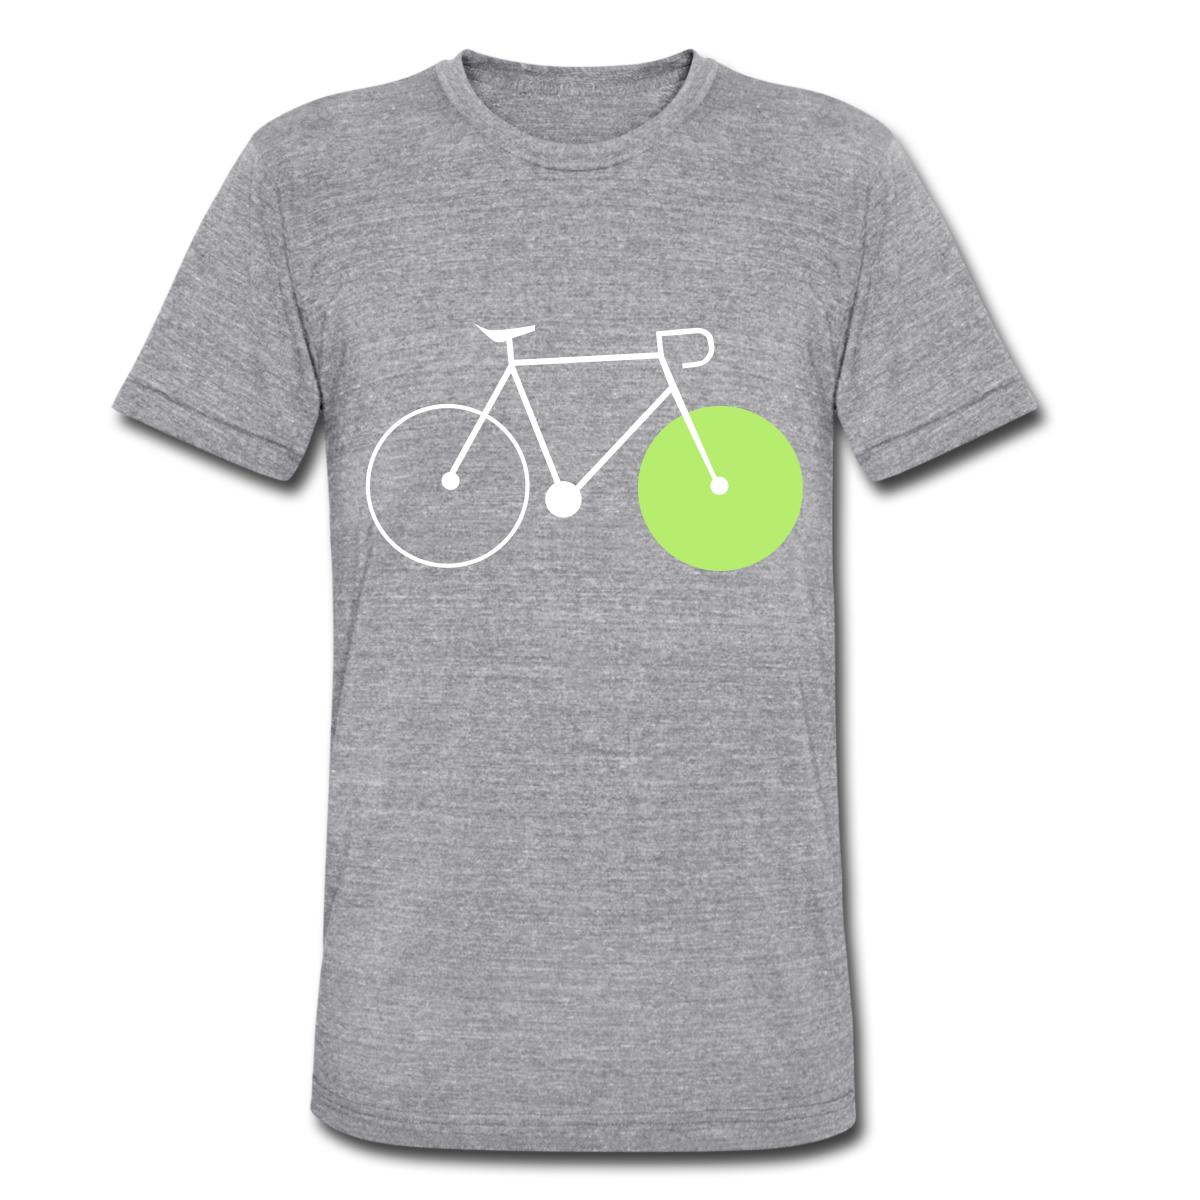 Bike Fahrrad Fixie Bike T Shirts Shirt Design Inspiration Tshirt Design Inspiration Printed Shirts